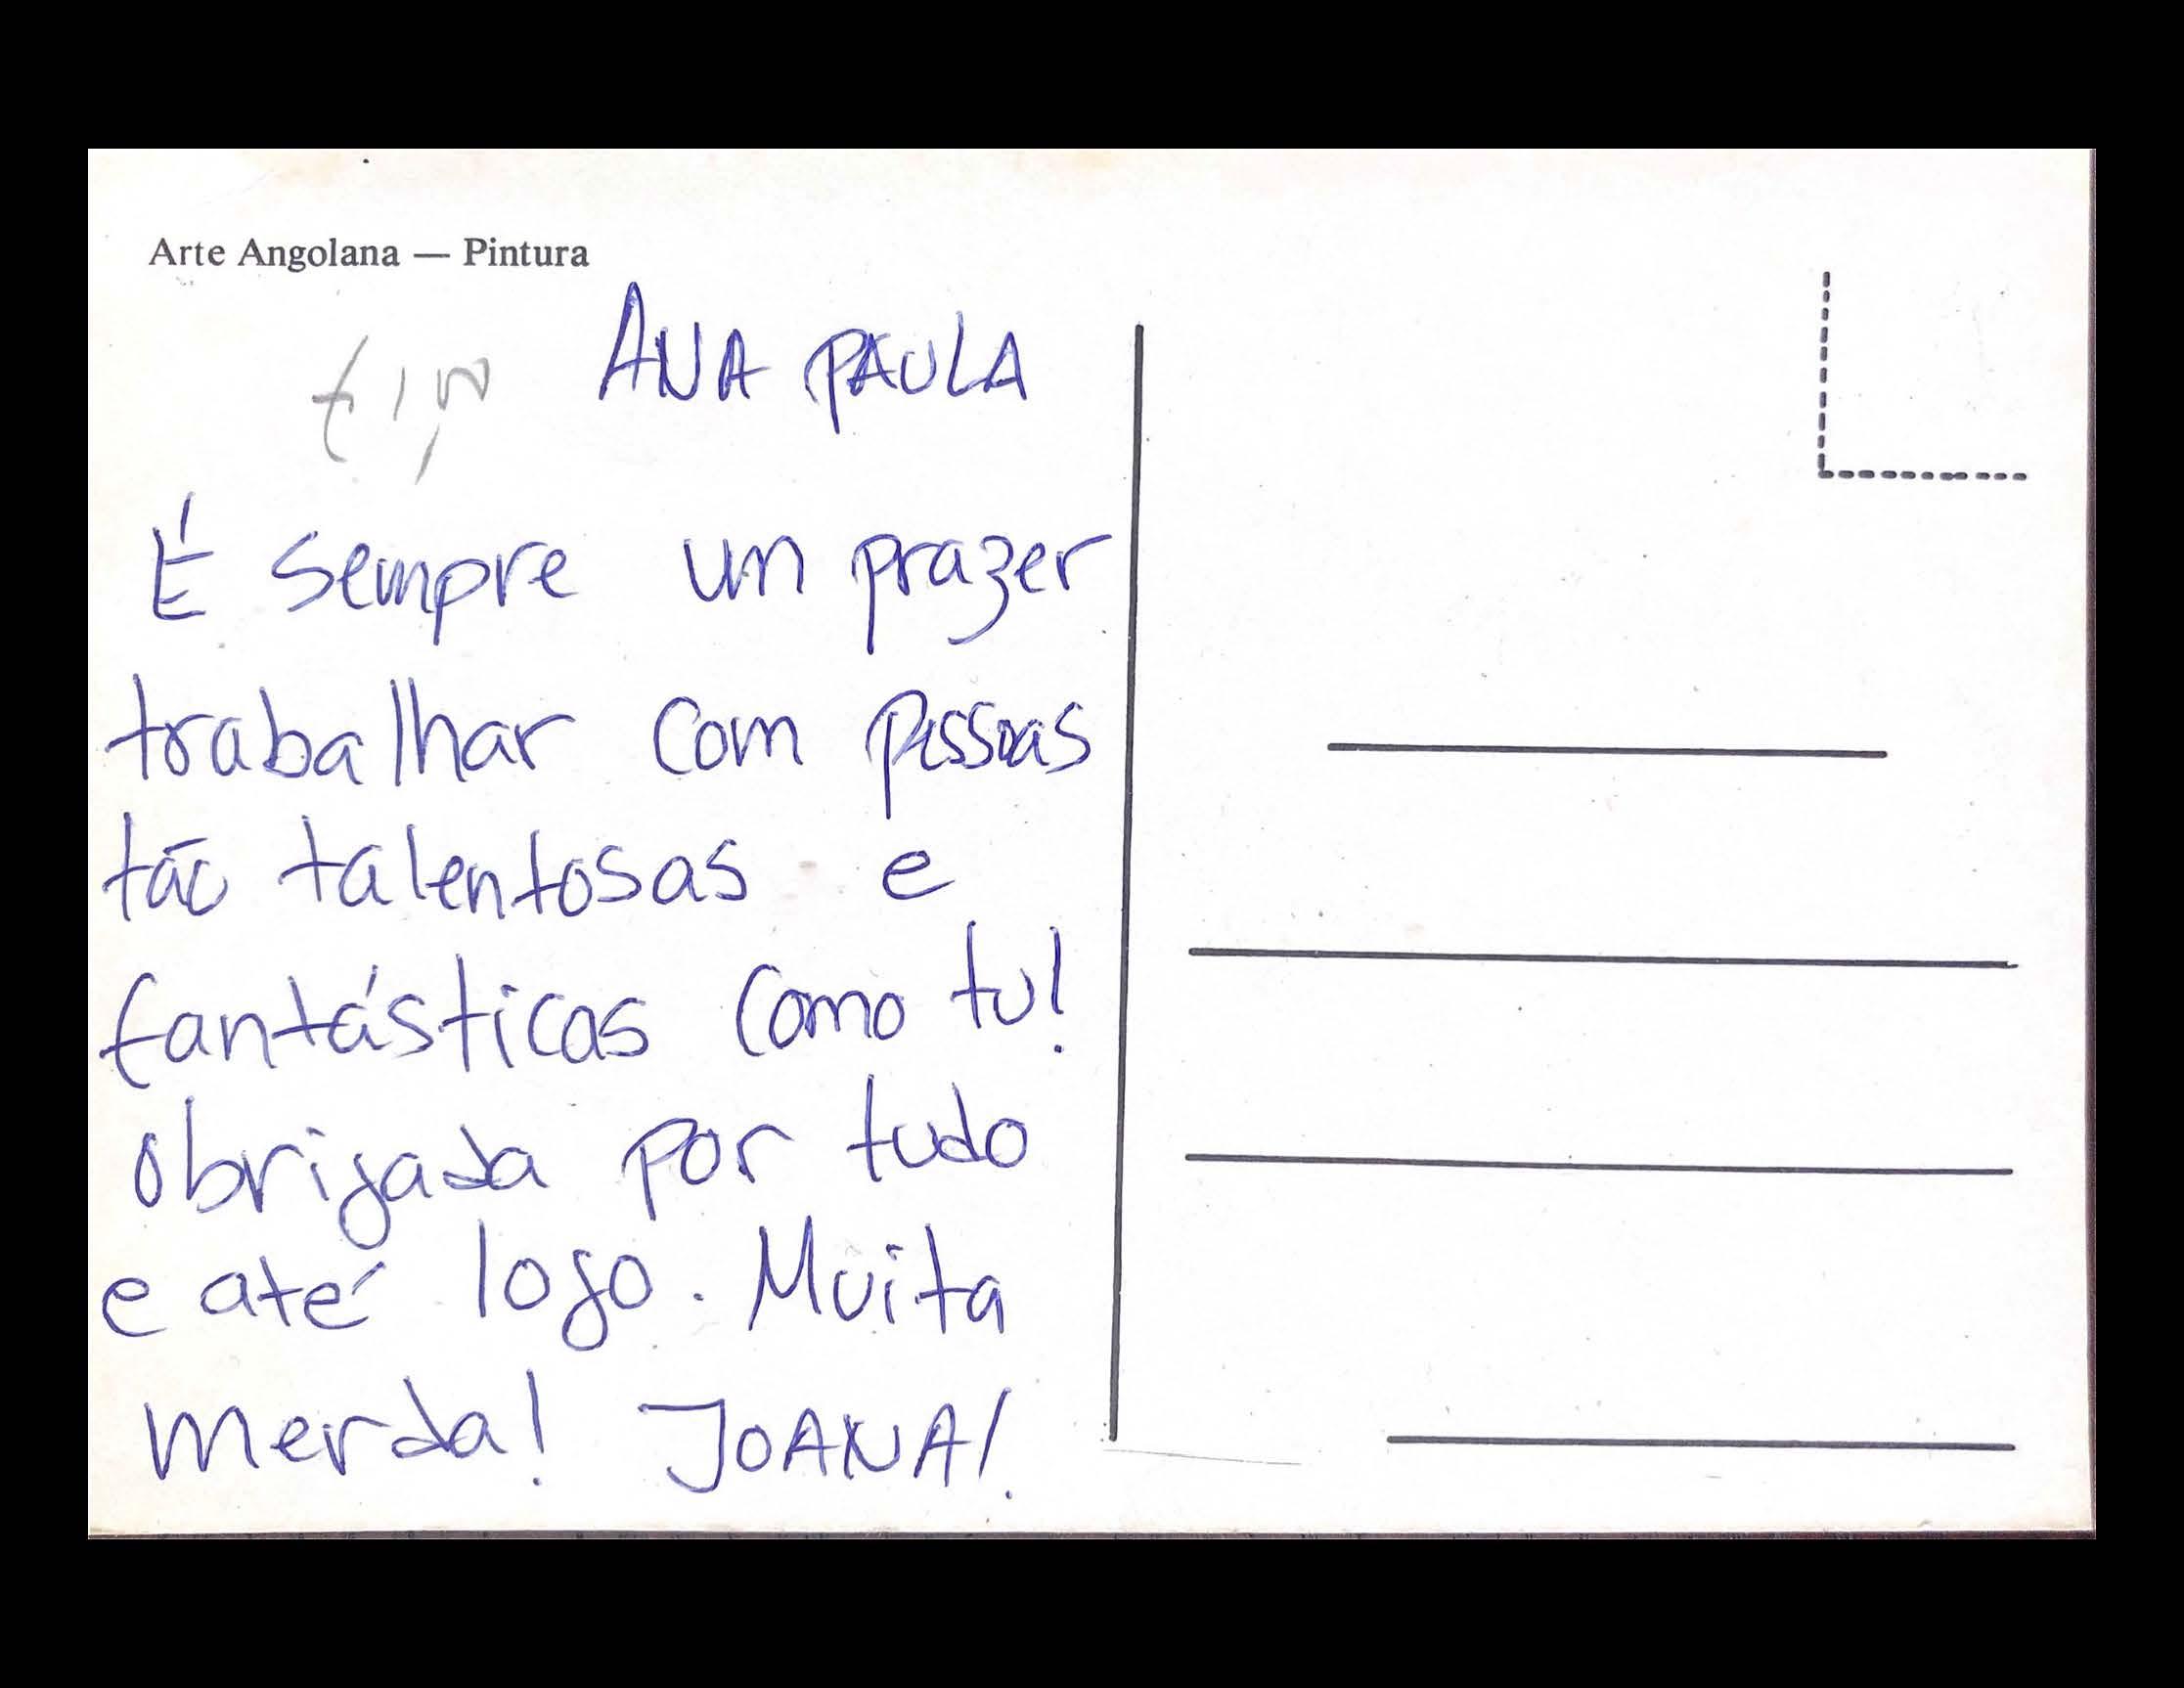 Ana Paula Rocha - Testemunhos - 020